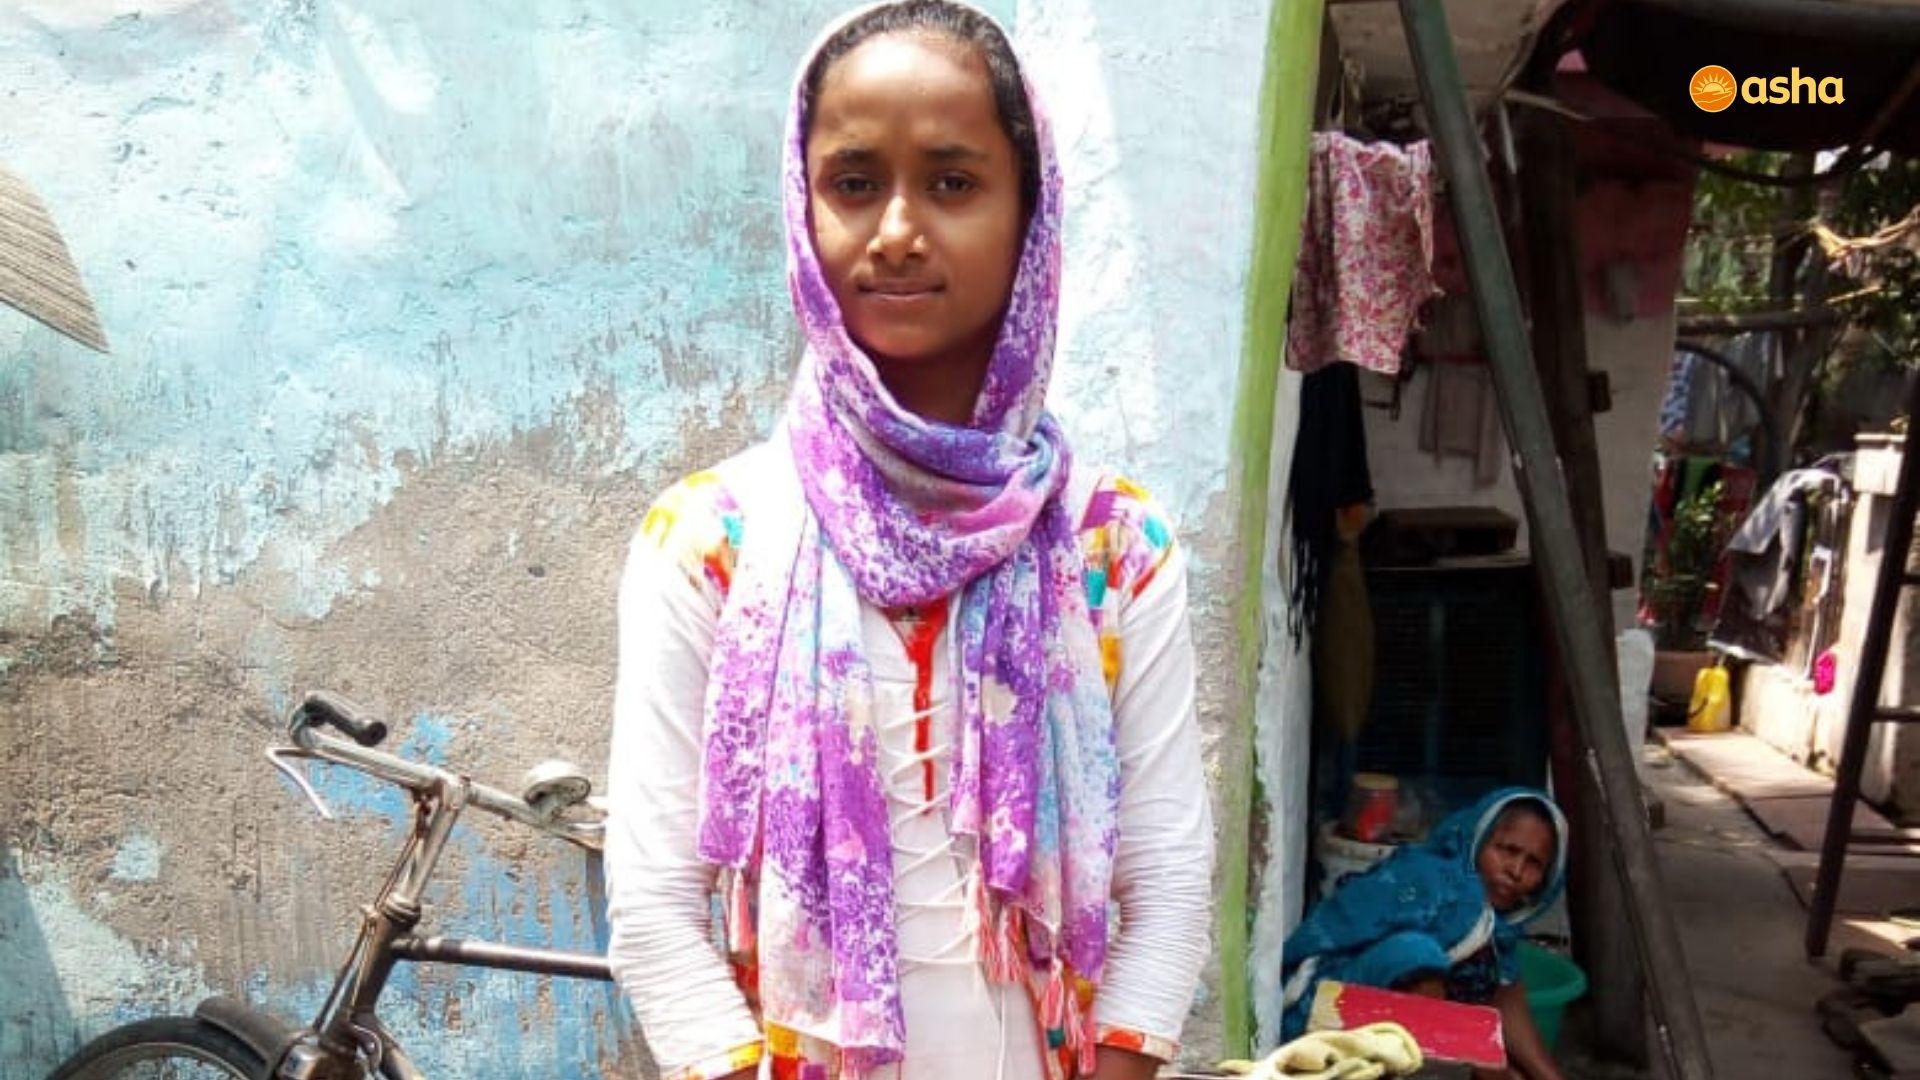 Mehjabeen in front of her shanty in Janta Camp (near Asha's Anna Nagar slum community)